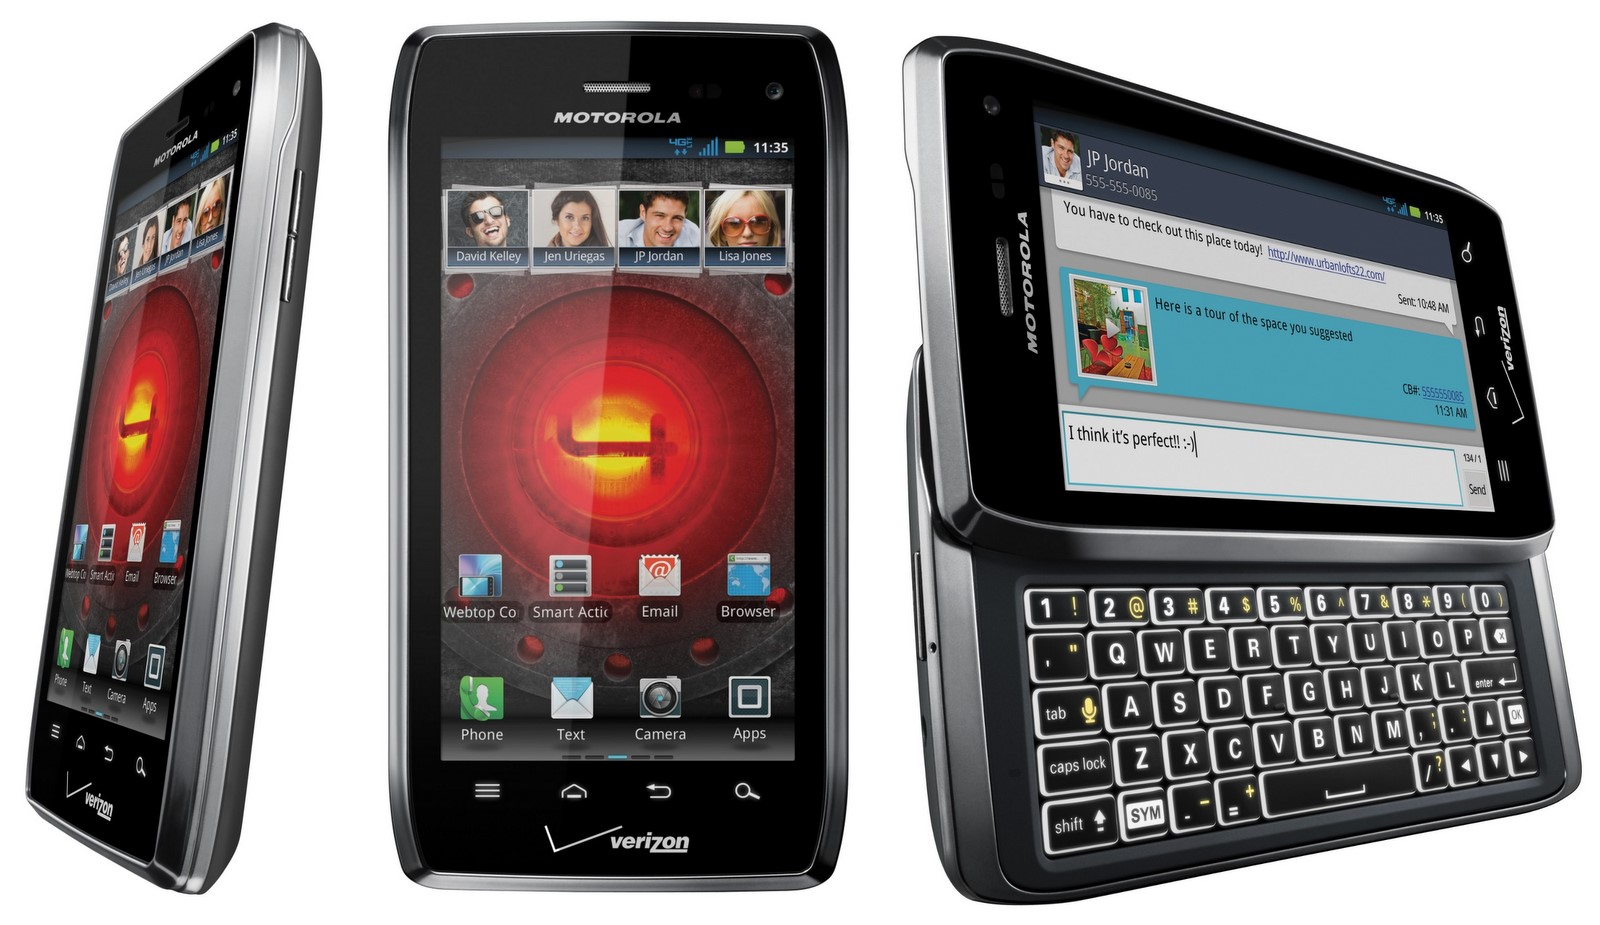 motorola droid 4 user guide how to and user guide instructions u2022 rh taxibermuda co Motorola Android Apps Motorola Android Phones List